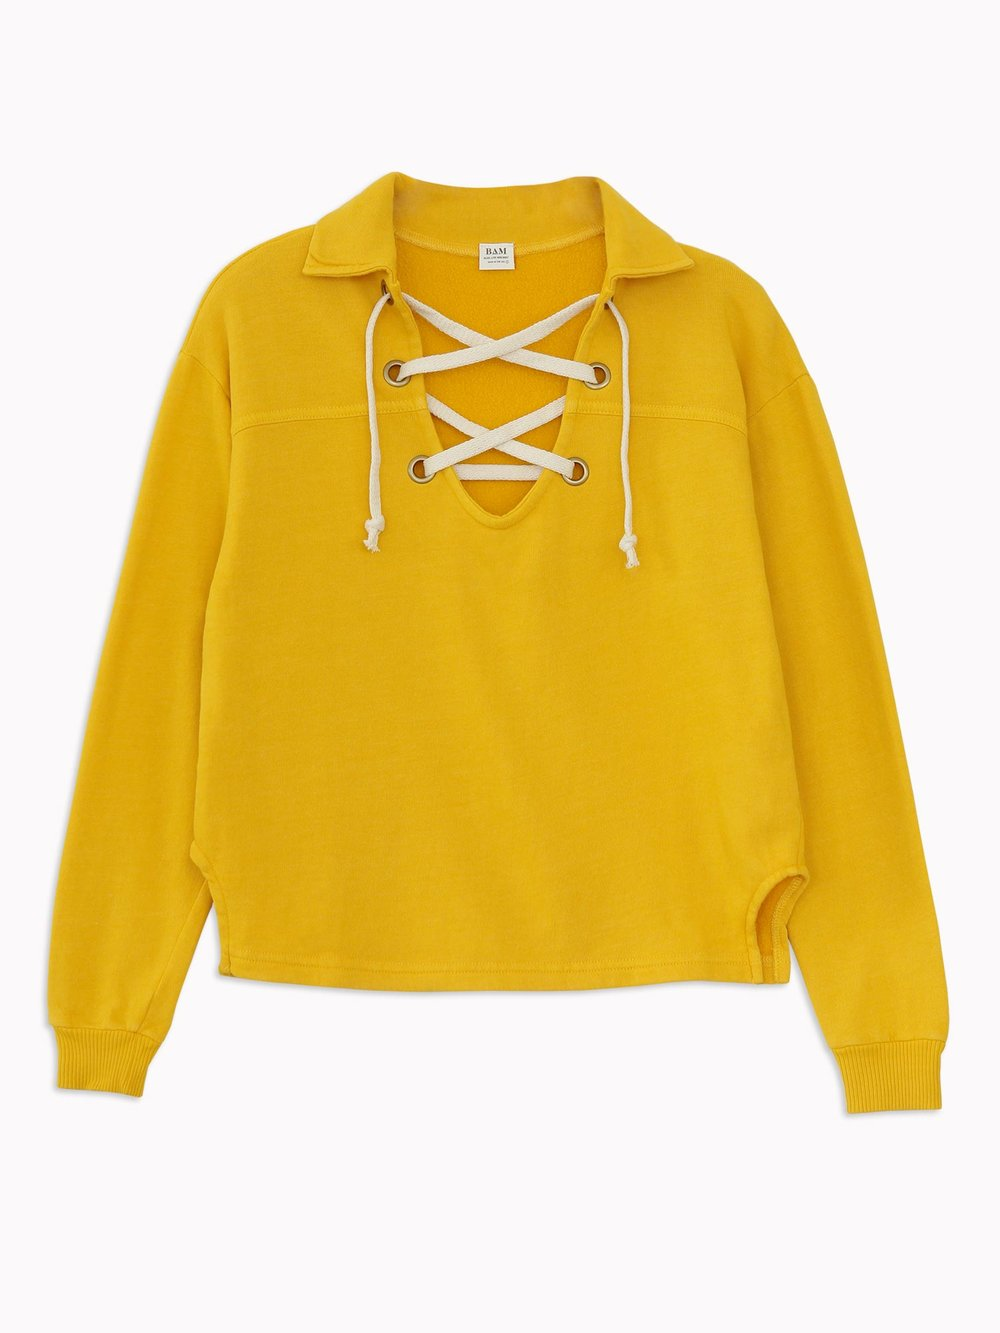 O'Hara Sweatshirt in Ochre.jpg